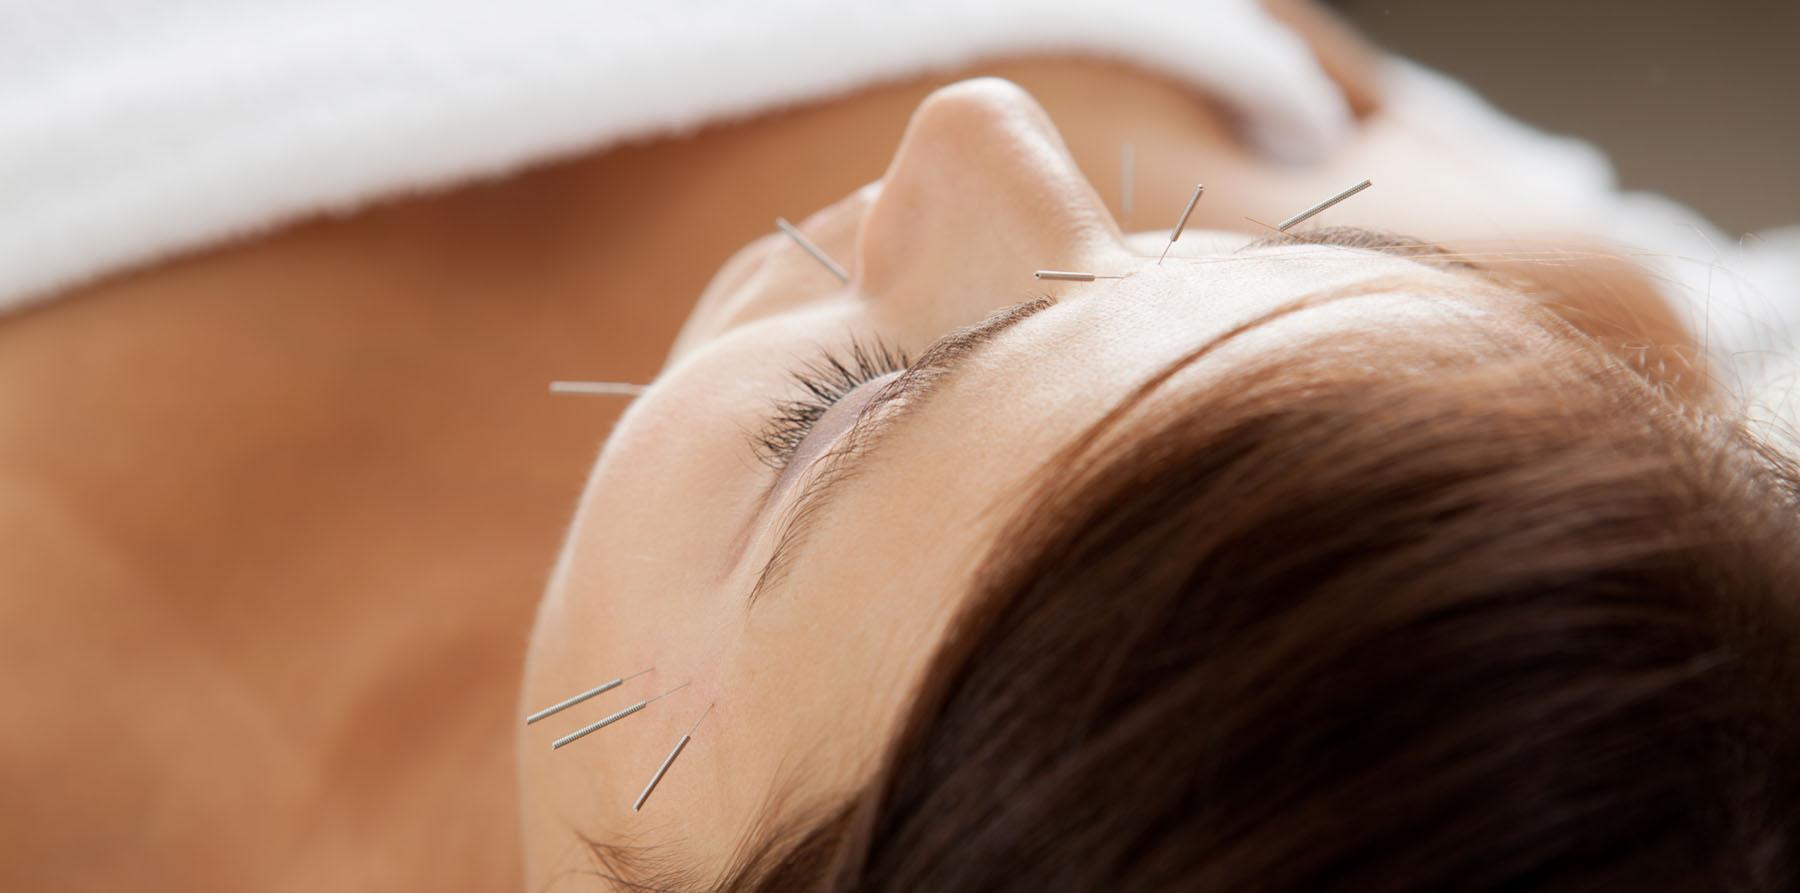 acupuncture-facial-rejuvenation.jpg